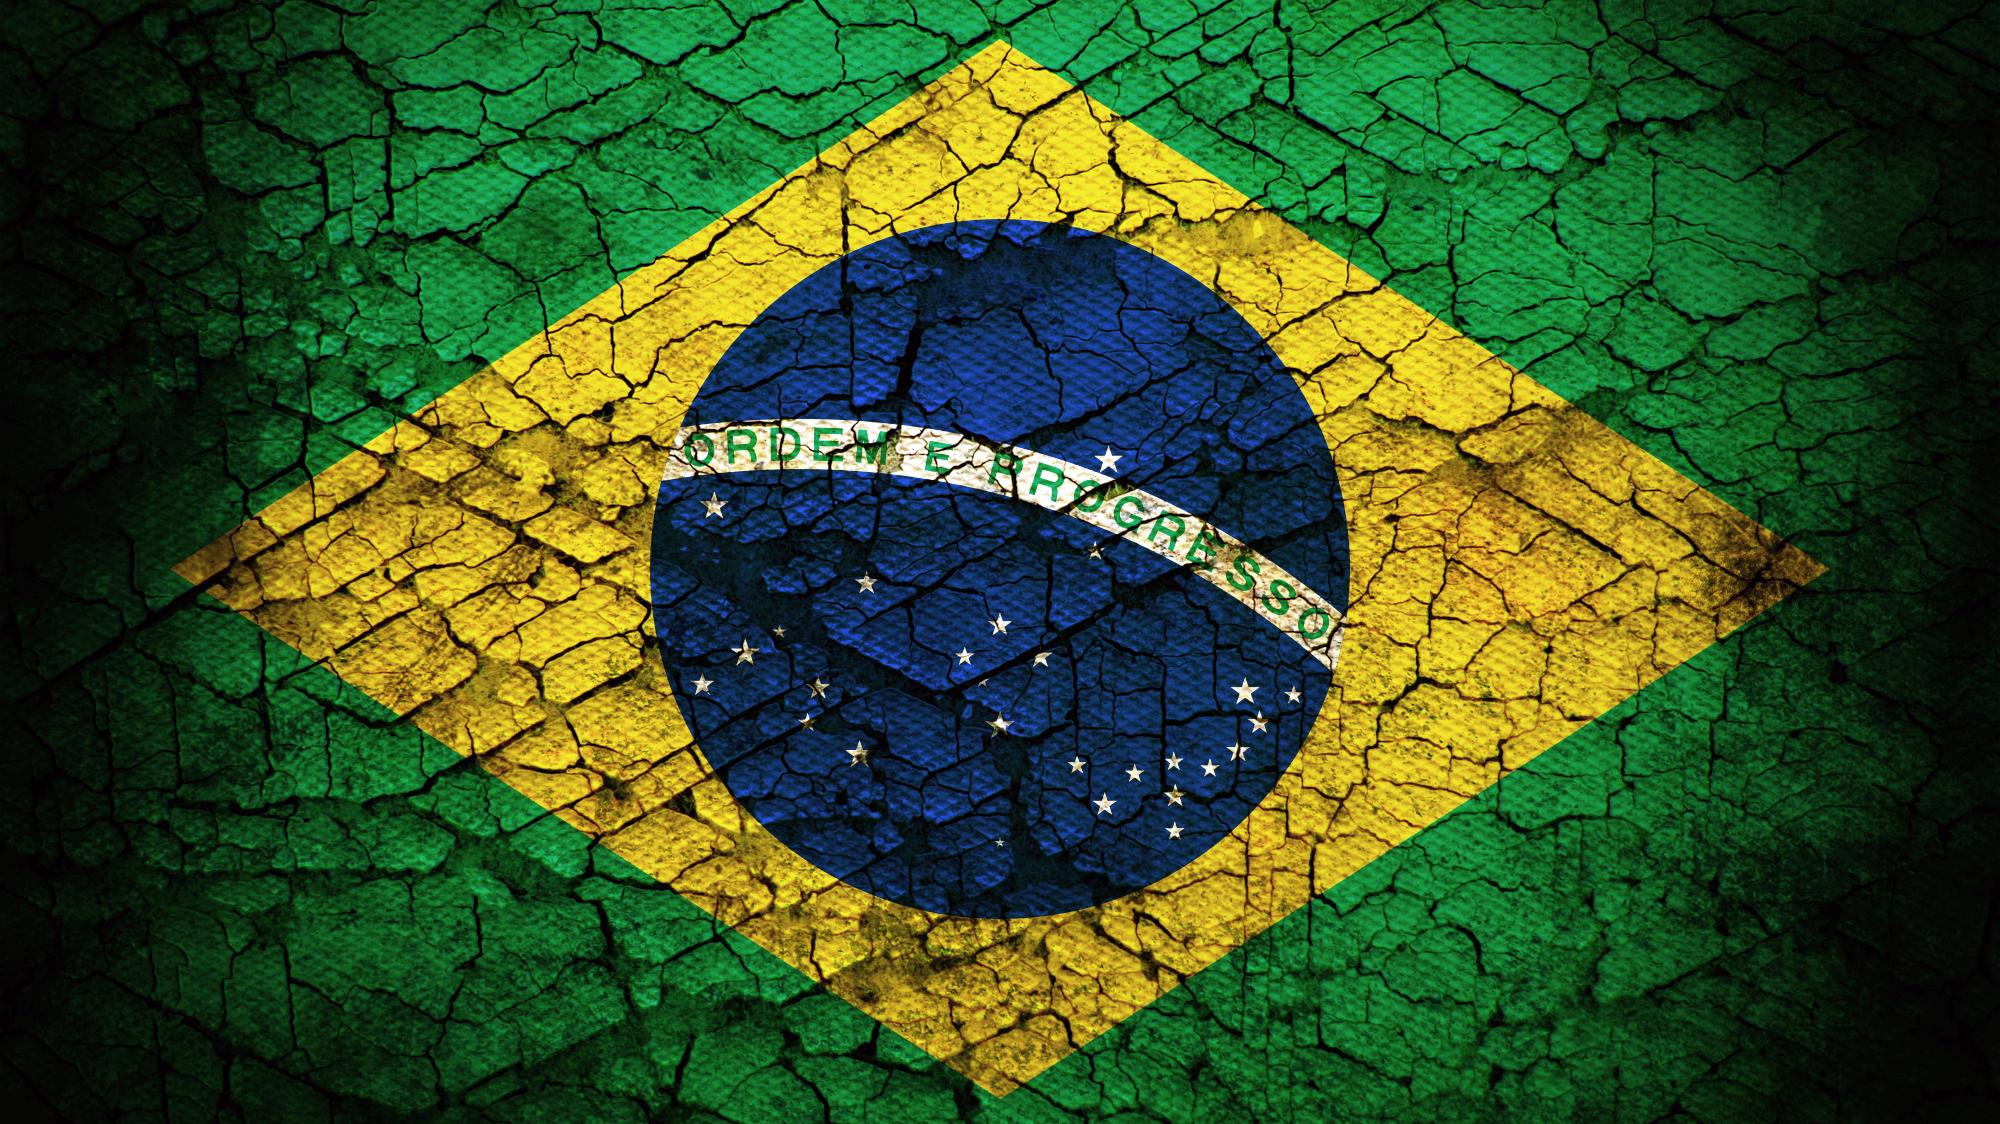 984903 Brasil Konrad Adenauer Schule